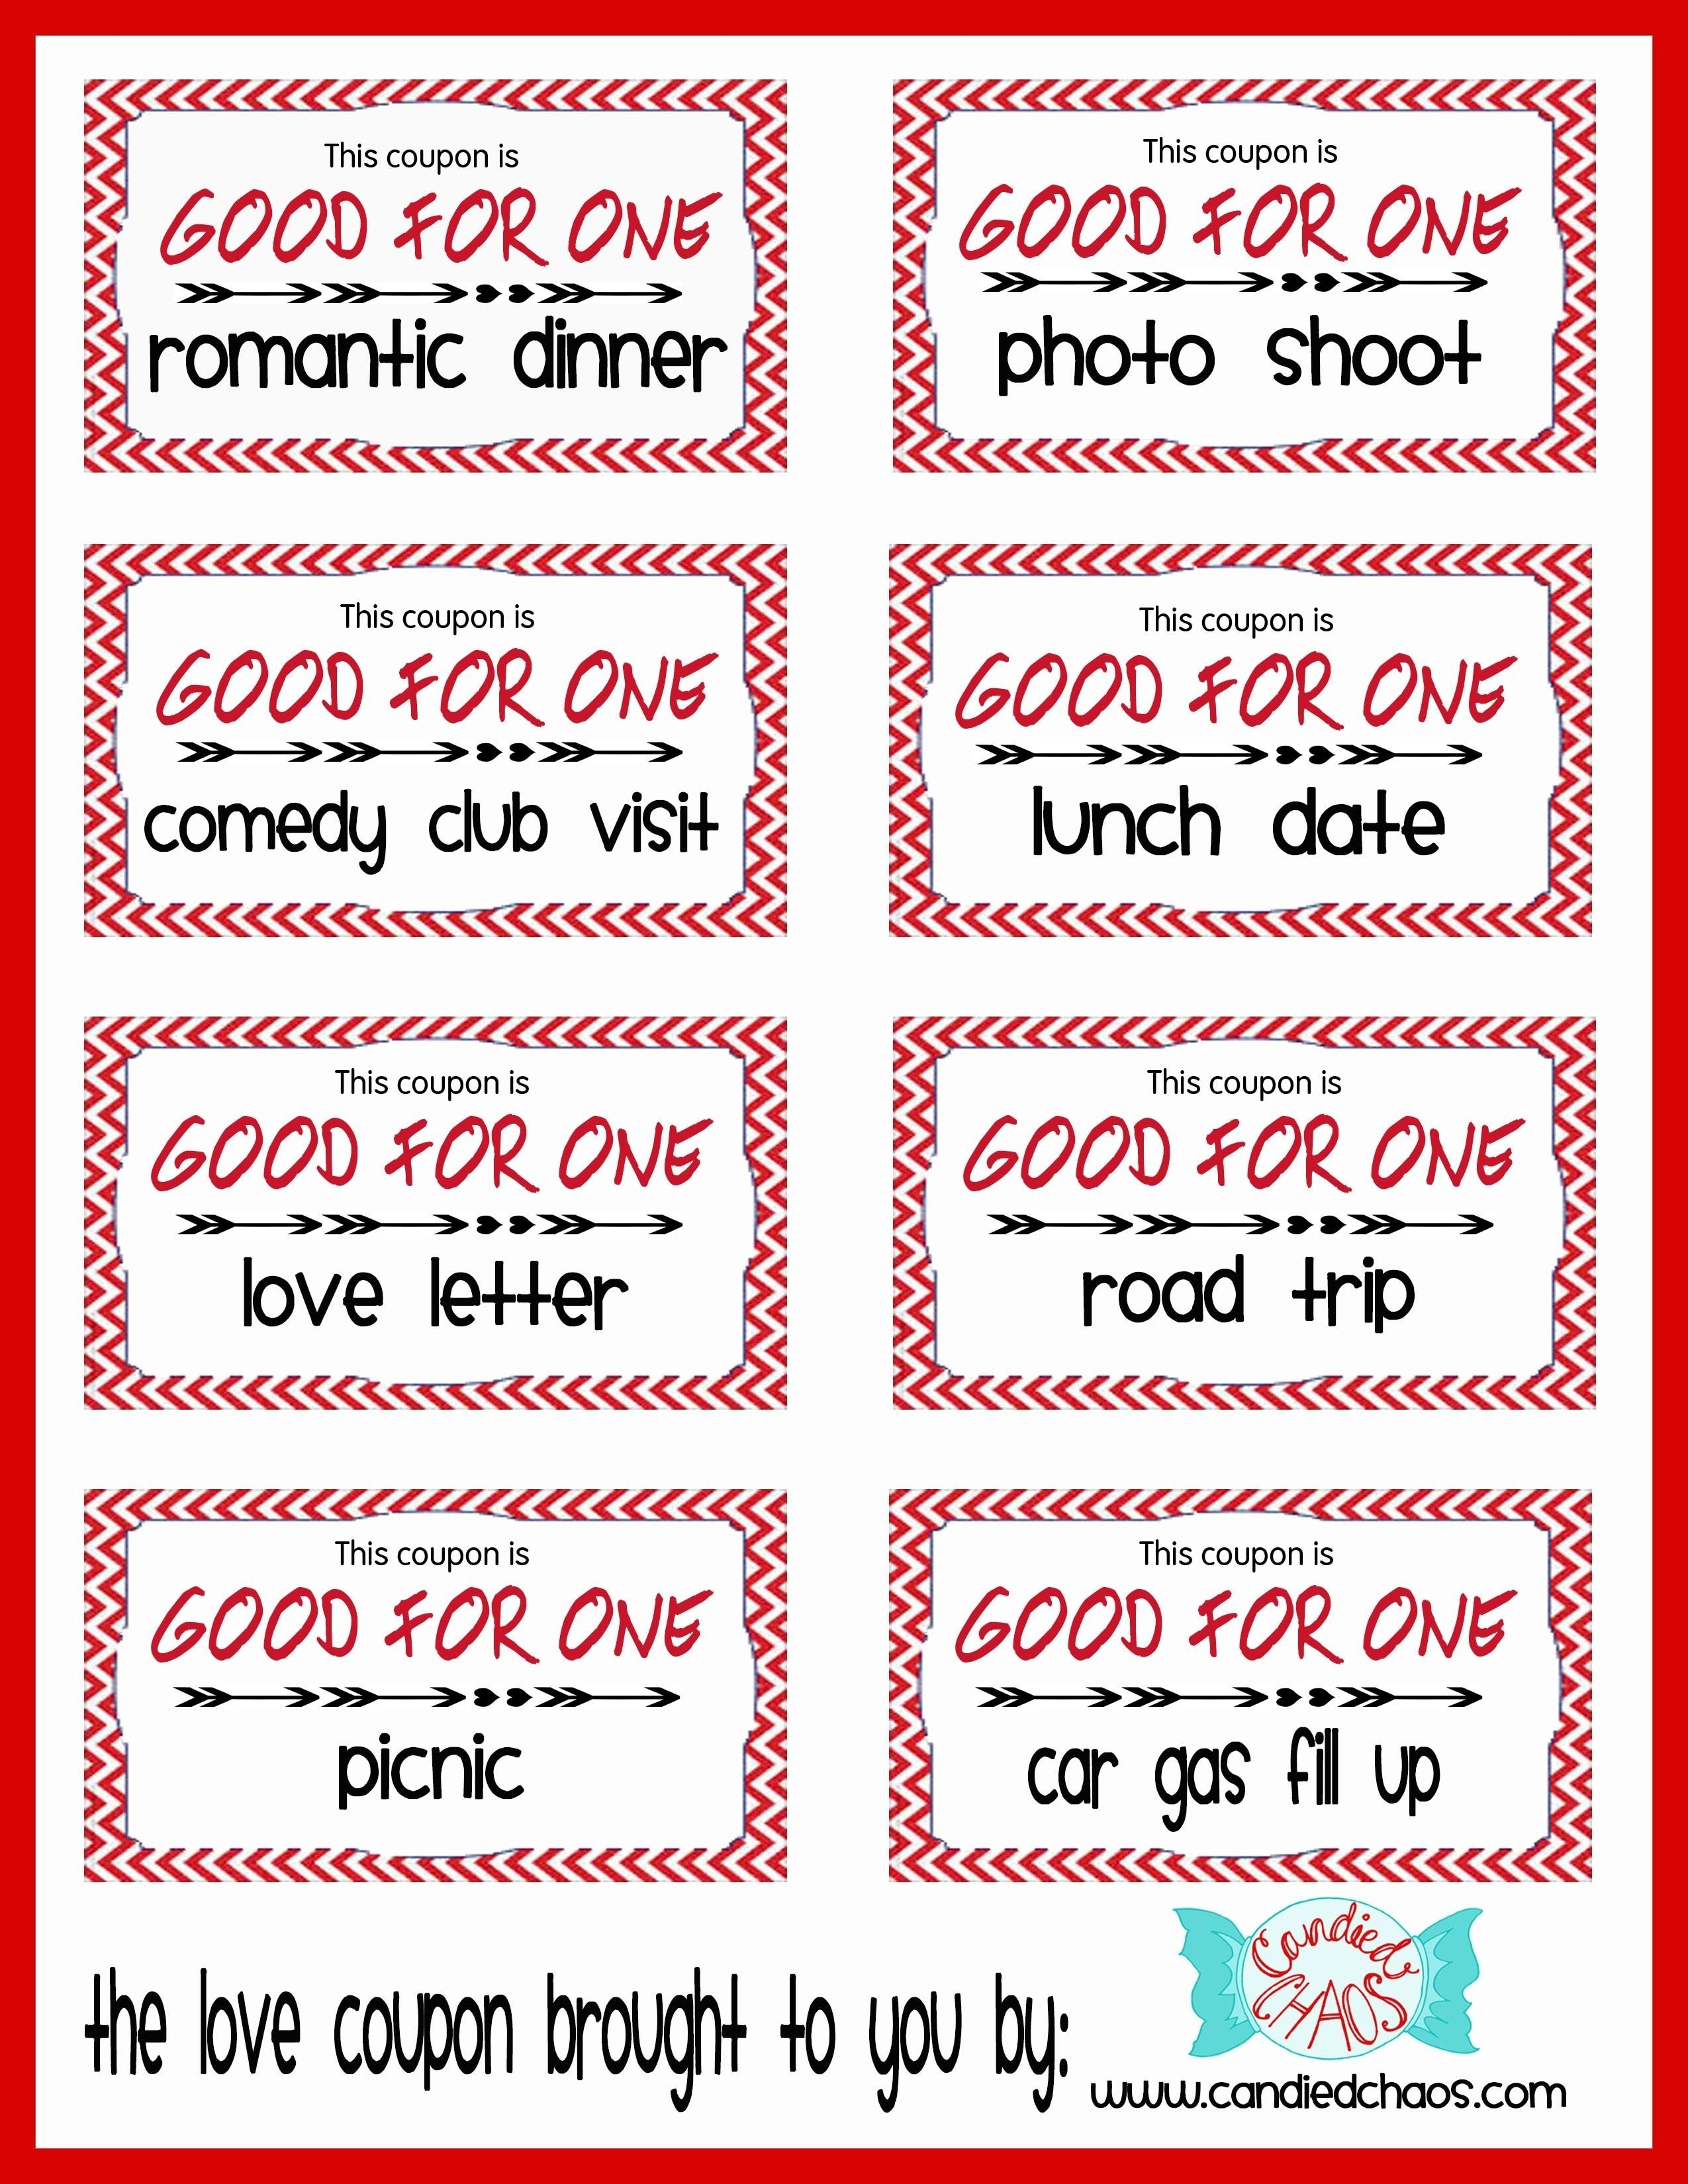 10 Great Coupon Book Ideas For Boyfriend couponpg2 2550x3300 pixels crafty shiz pinterest